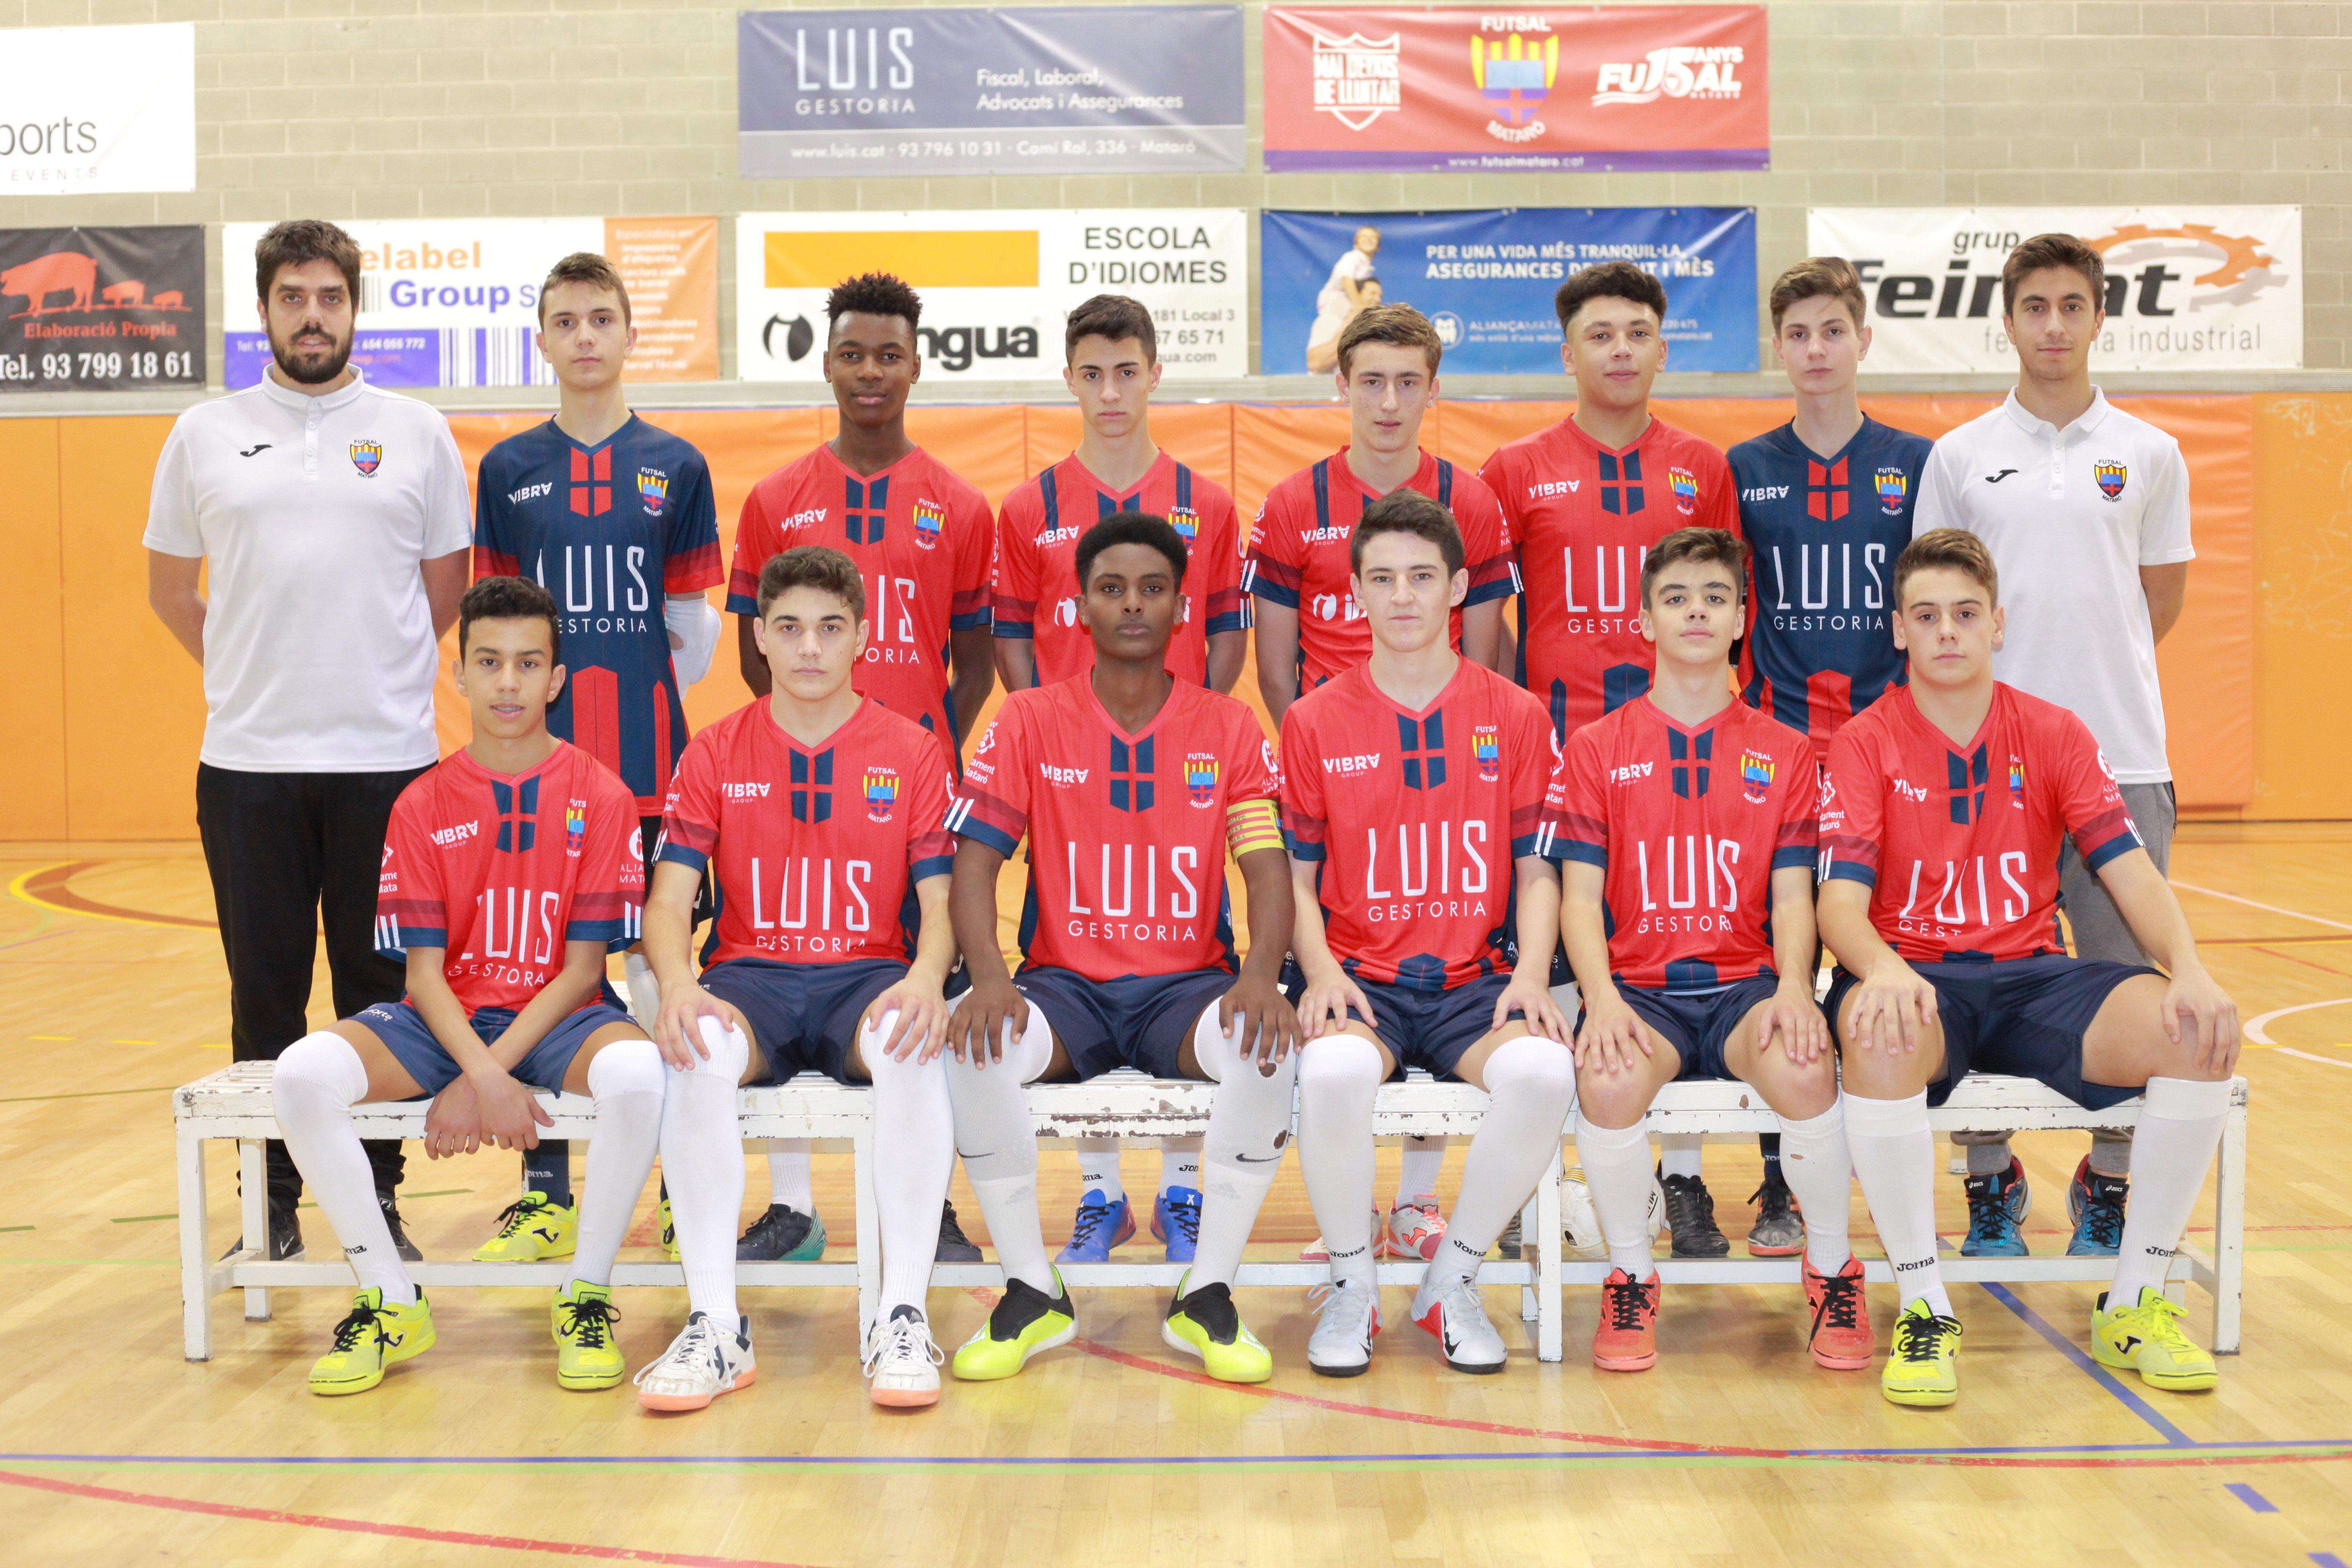 Presentació Equips CE Futsal Mataró Temporada 2018-2019